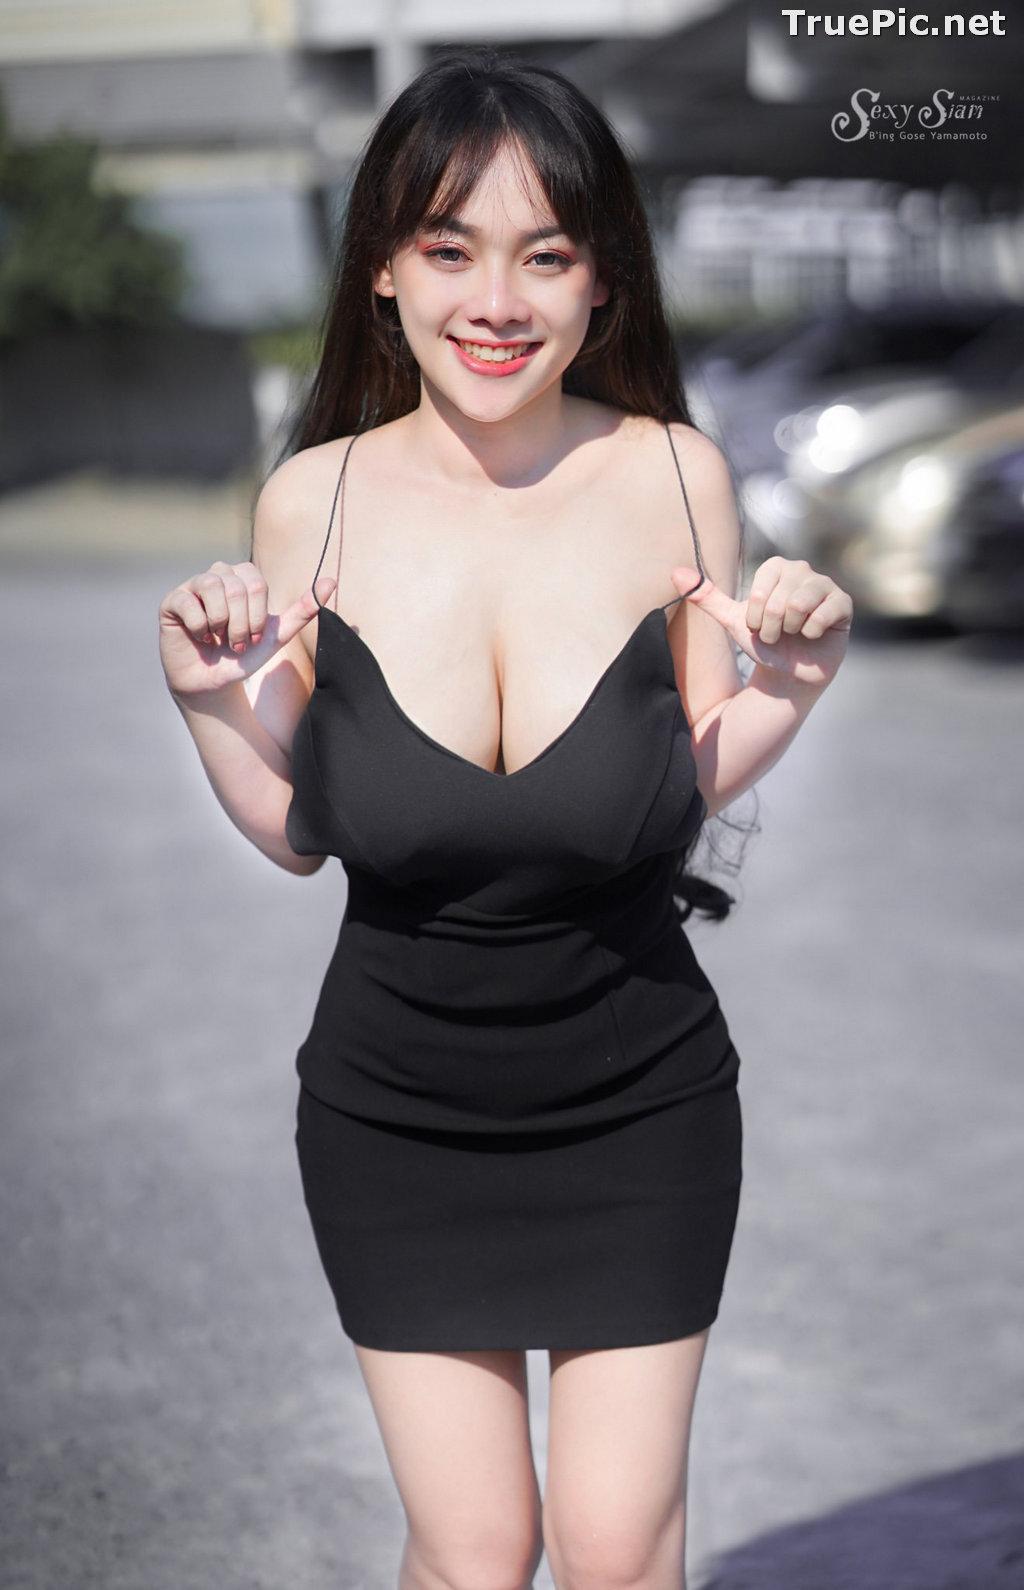 Image Thailand Model - จุ๊ปเปอร์ จุ๊ป - Sexy Black Car Girl - TruePic.net - Picture-1